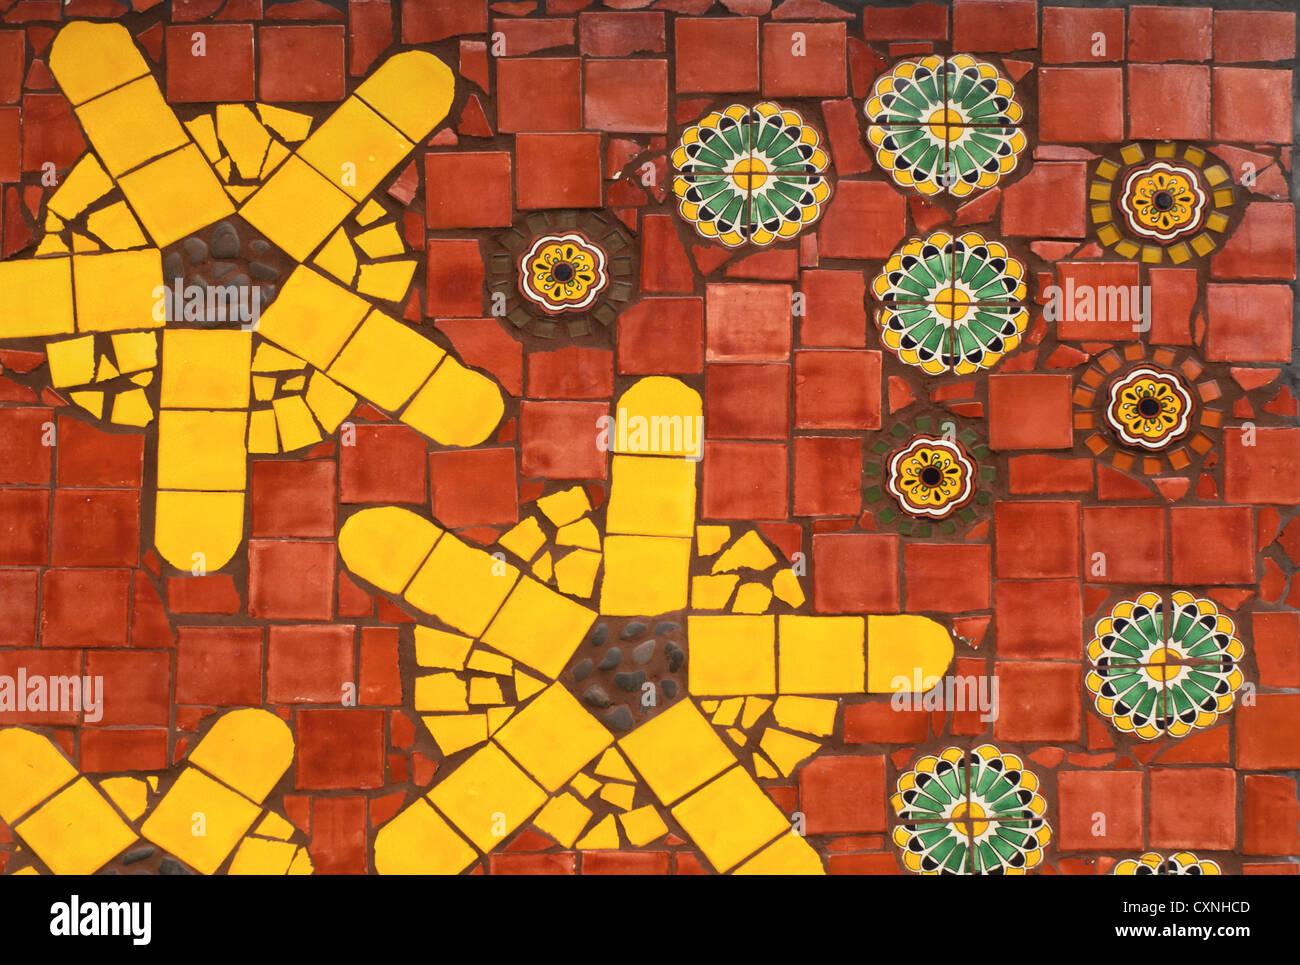 wall of Moravian tiles - Stock Image